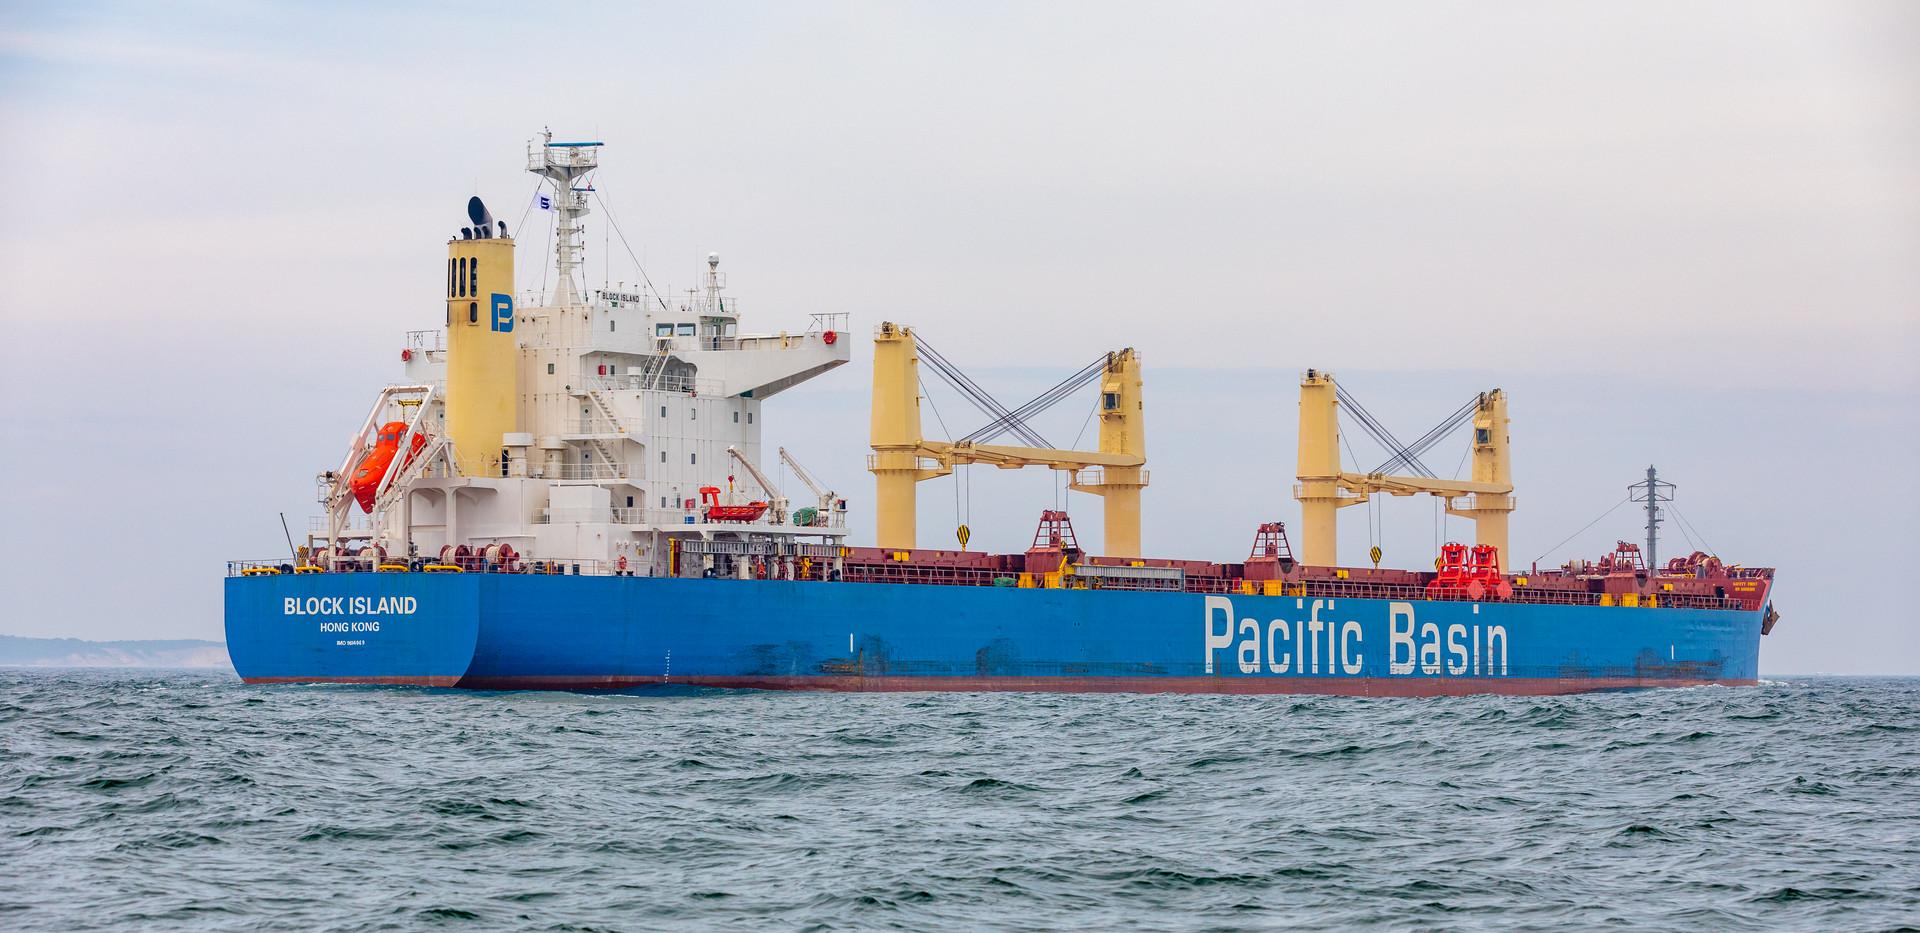 MV Block Island by Patrick Sikes-42.jpg